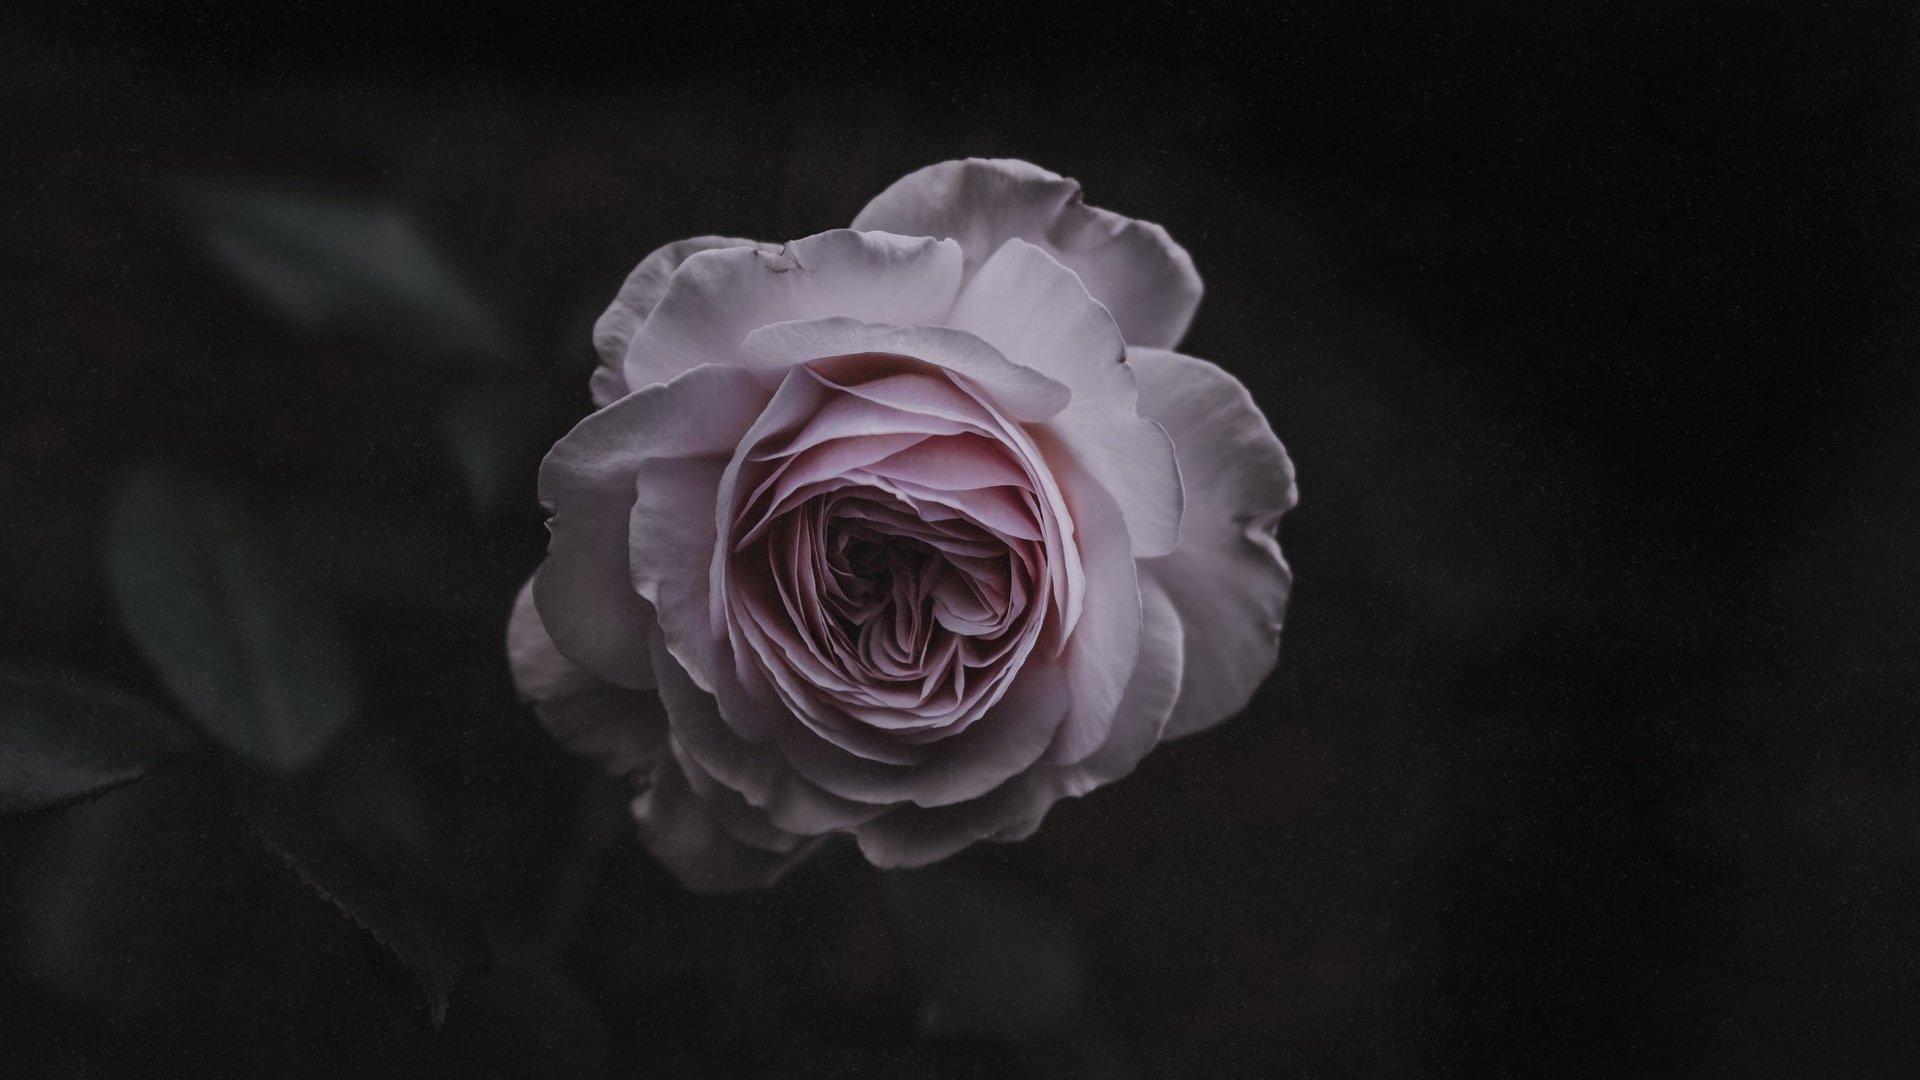 Aesthetic Rose Wallpaper Desktop